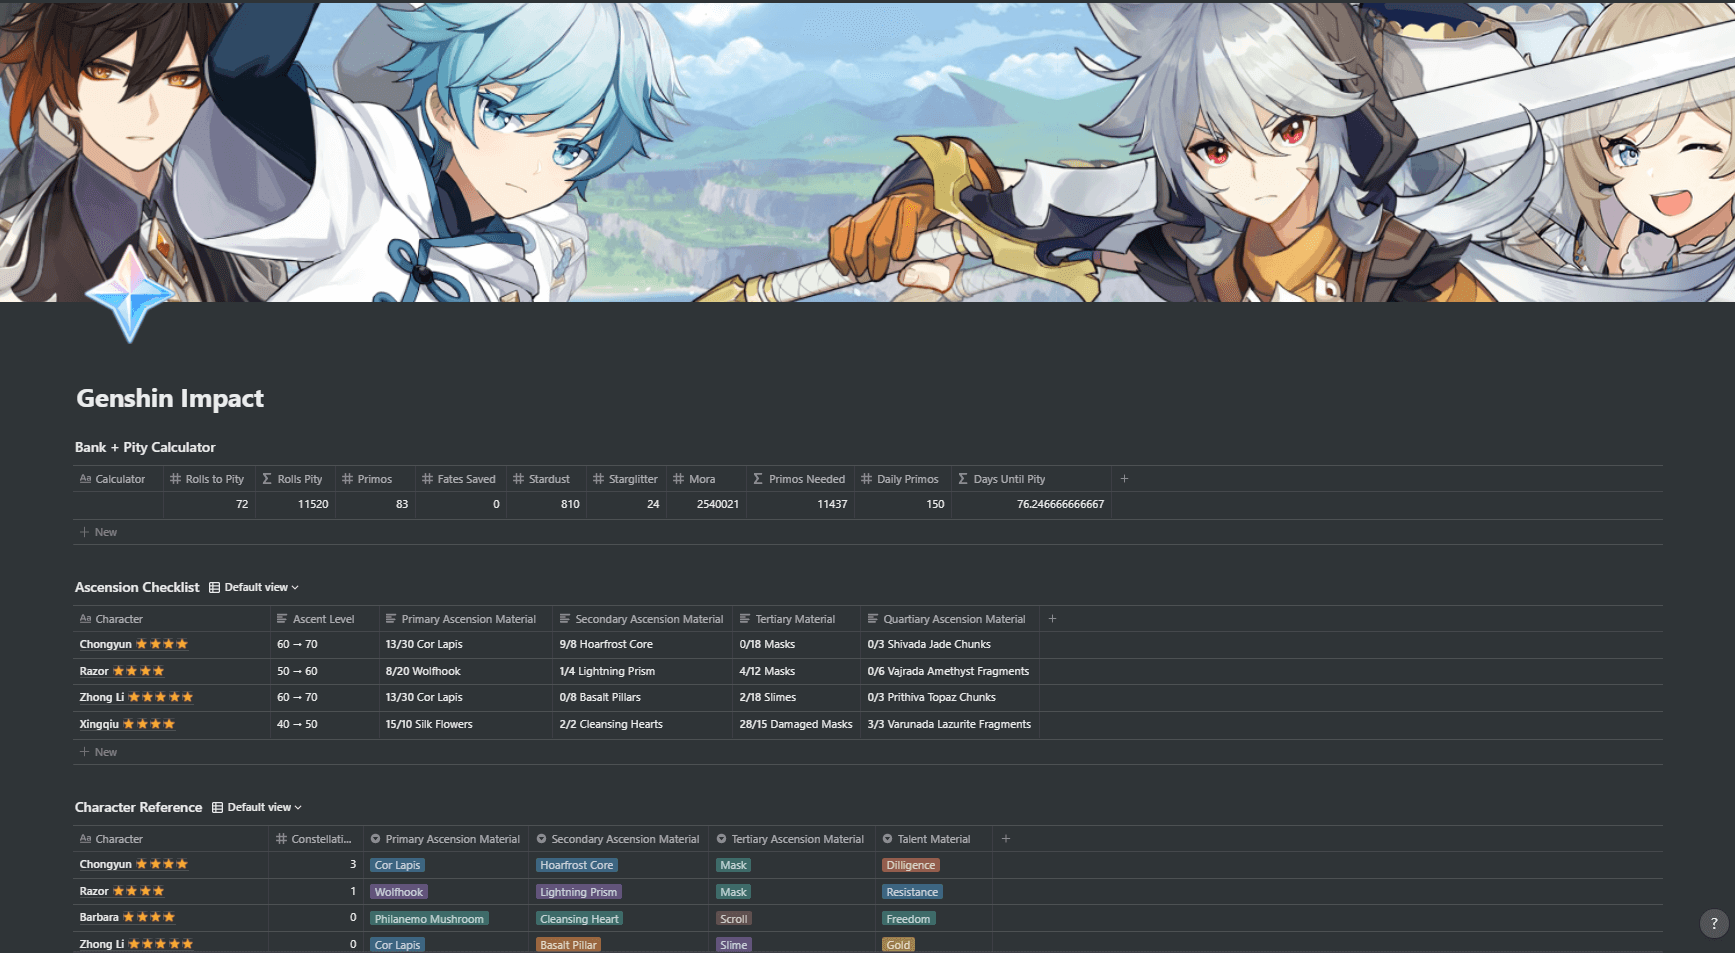 Genshin Impact Tracker